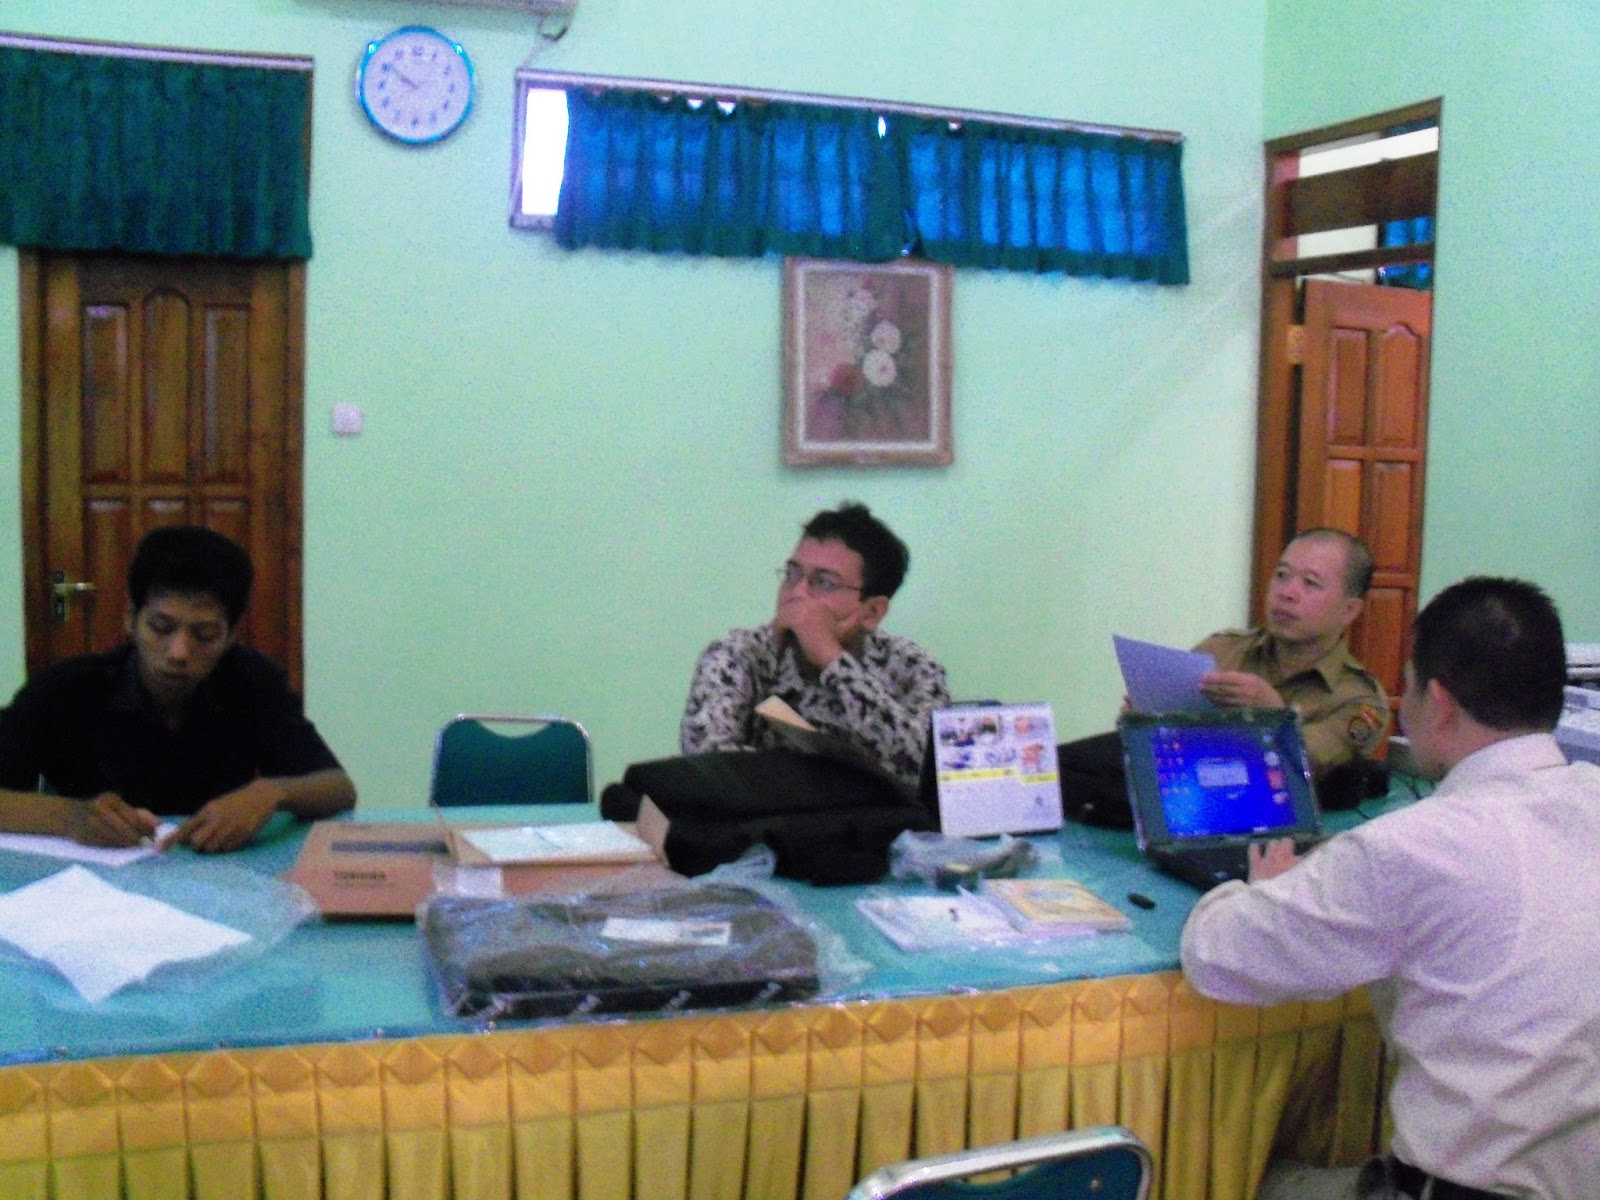 Nilai Try Out Smp N 4 Yogyakarta Depok Sleman Lomba Menulis Cerita Anak Islami Pro U Media Official Scanner Ljk Omr Dmr Smr Software Ljk Alat Koreksi Ljk